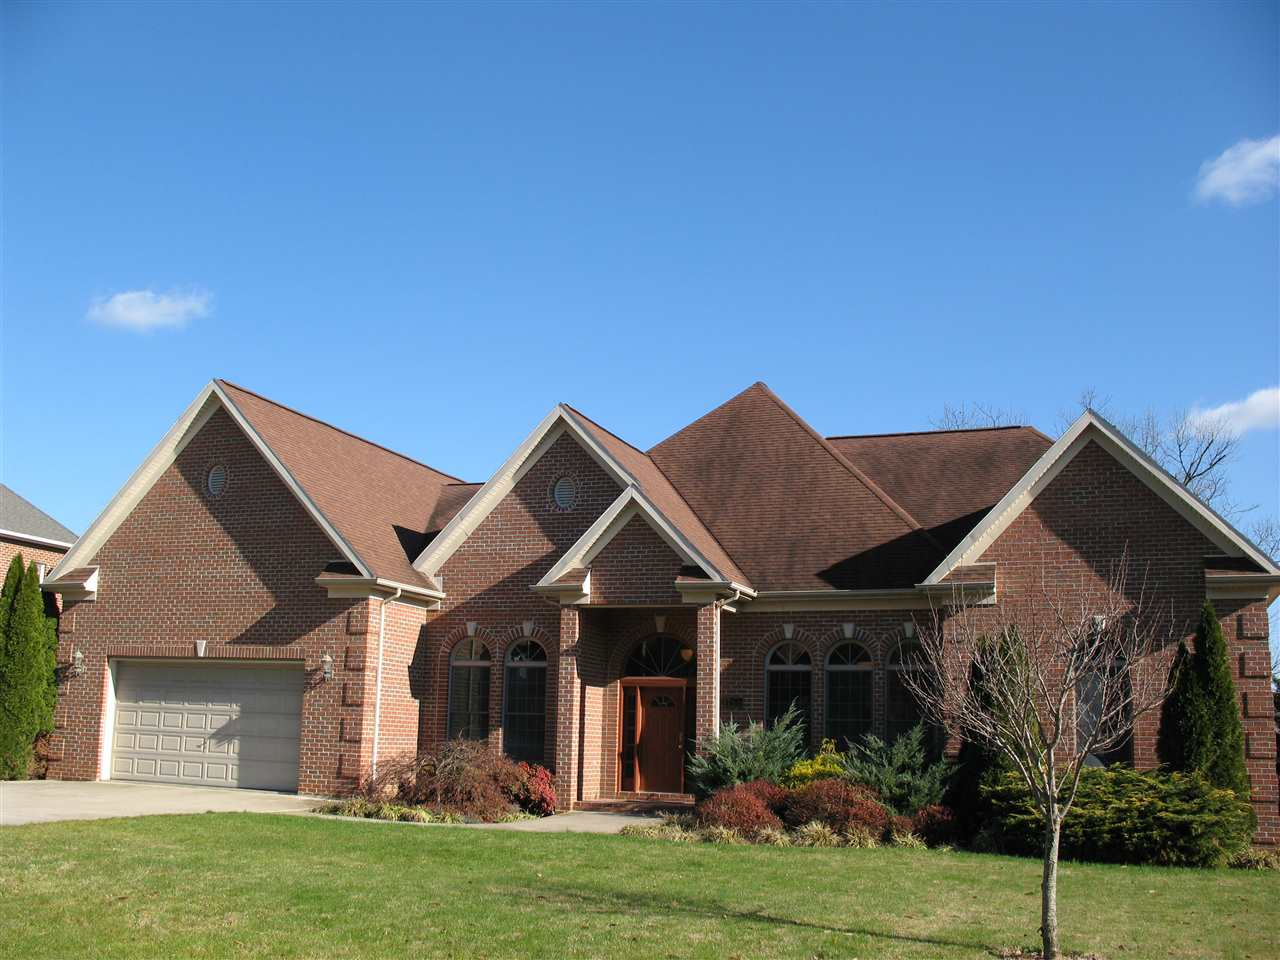 Rental Homes for Rent, ListingId:37199523, location: 3780 TRAVELER RD Rockingham 22801